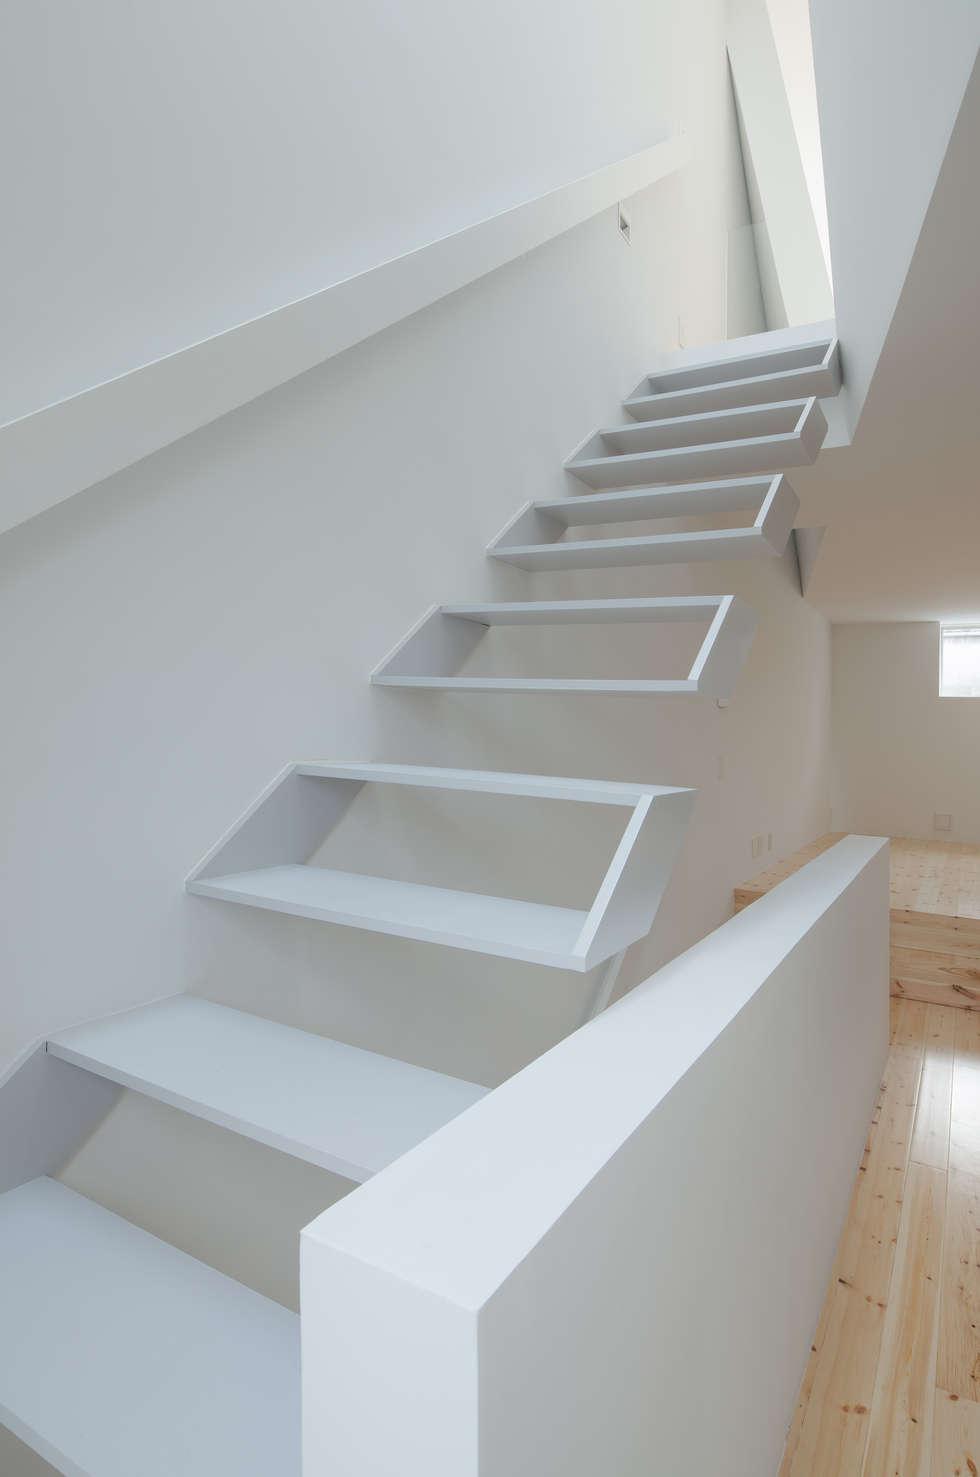 minimalistic Corridor, hallway & stairs by 井戸健治建築研究所 / Ido, Kenji Architectural Studio